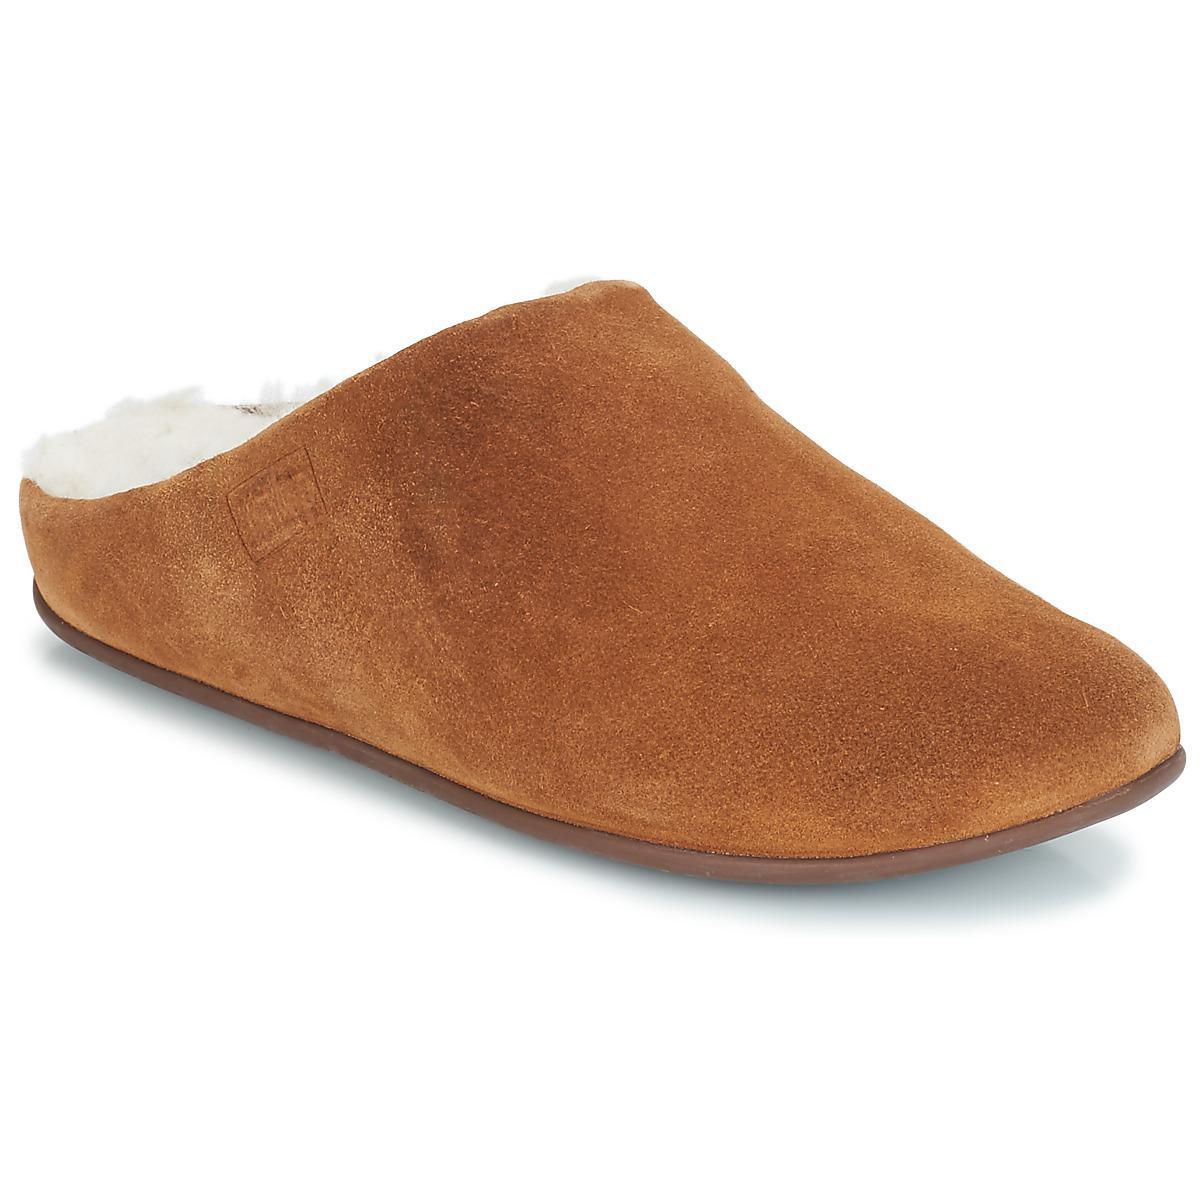 9bd2079d1 Fitflop Chrissie Shearling Flip Flops in Brown - Lyst